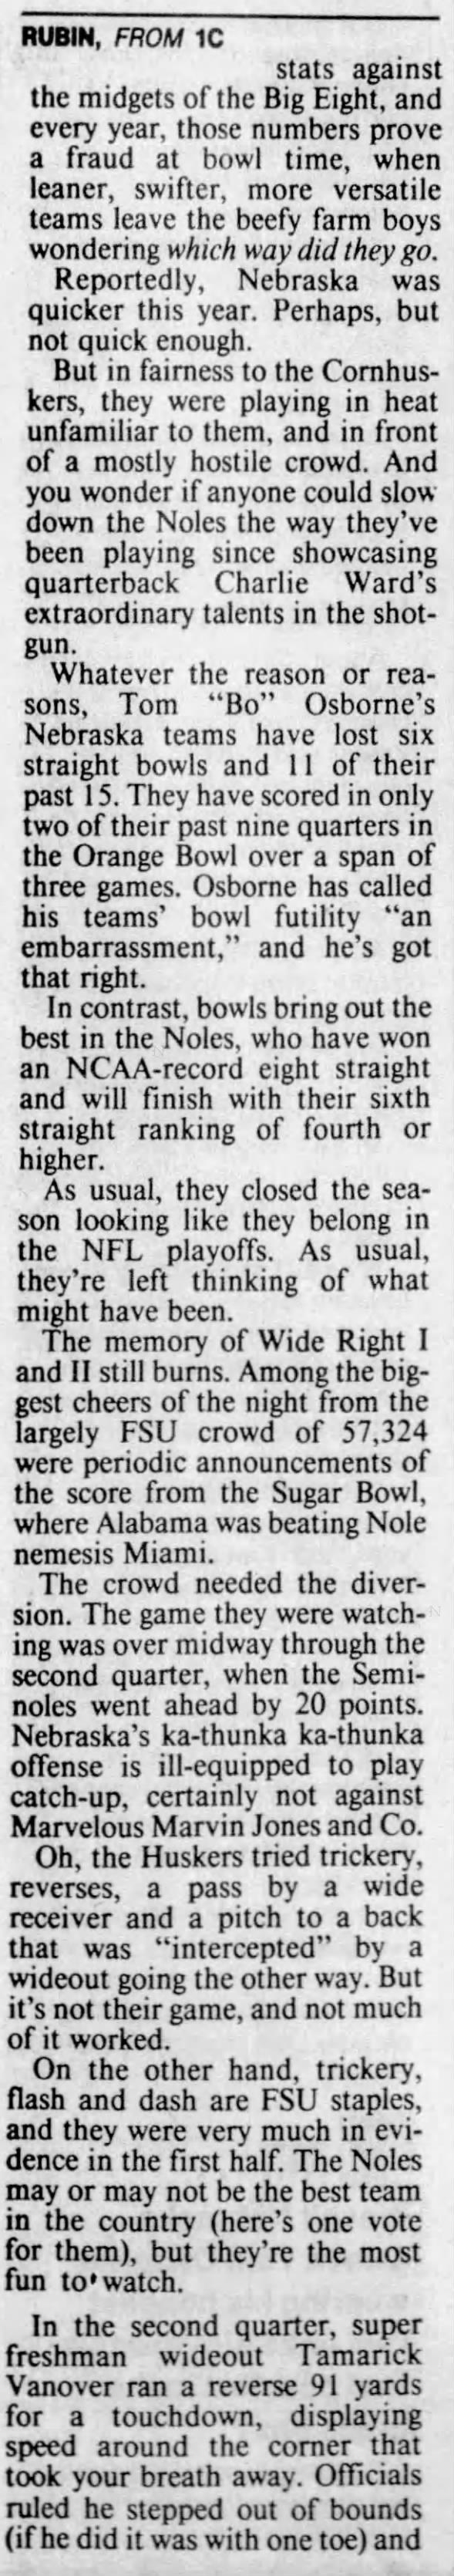 1993 Orange Bowl, Rubin column 2